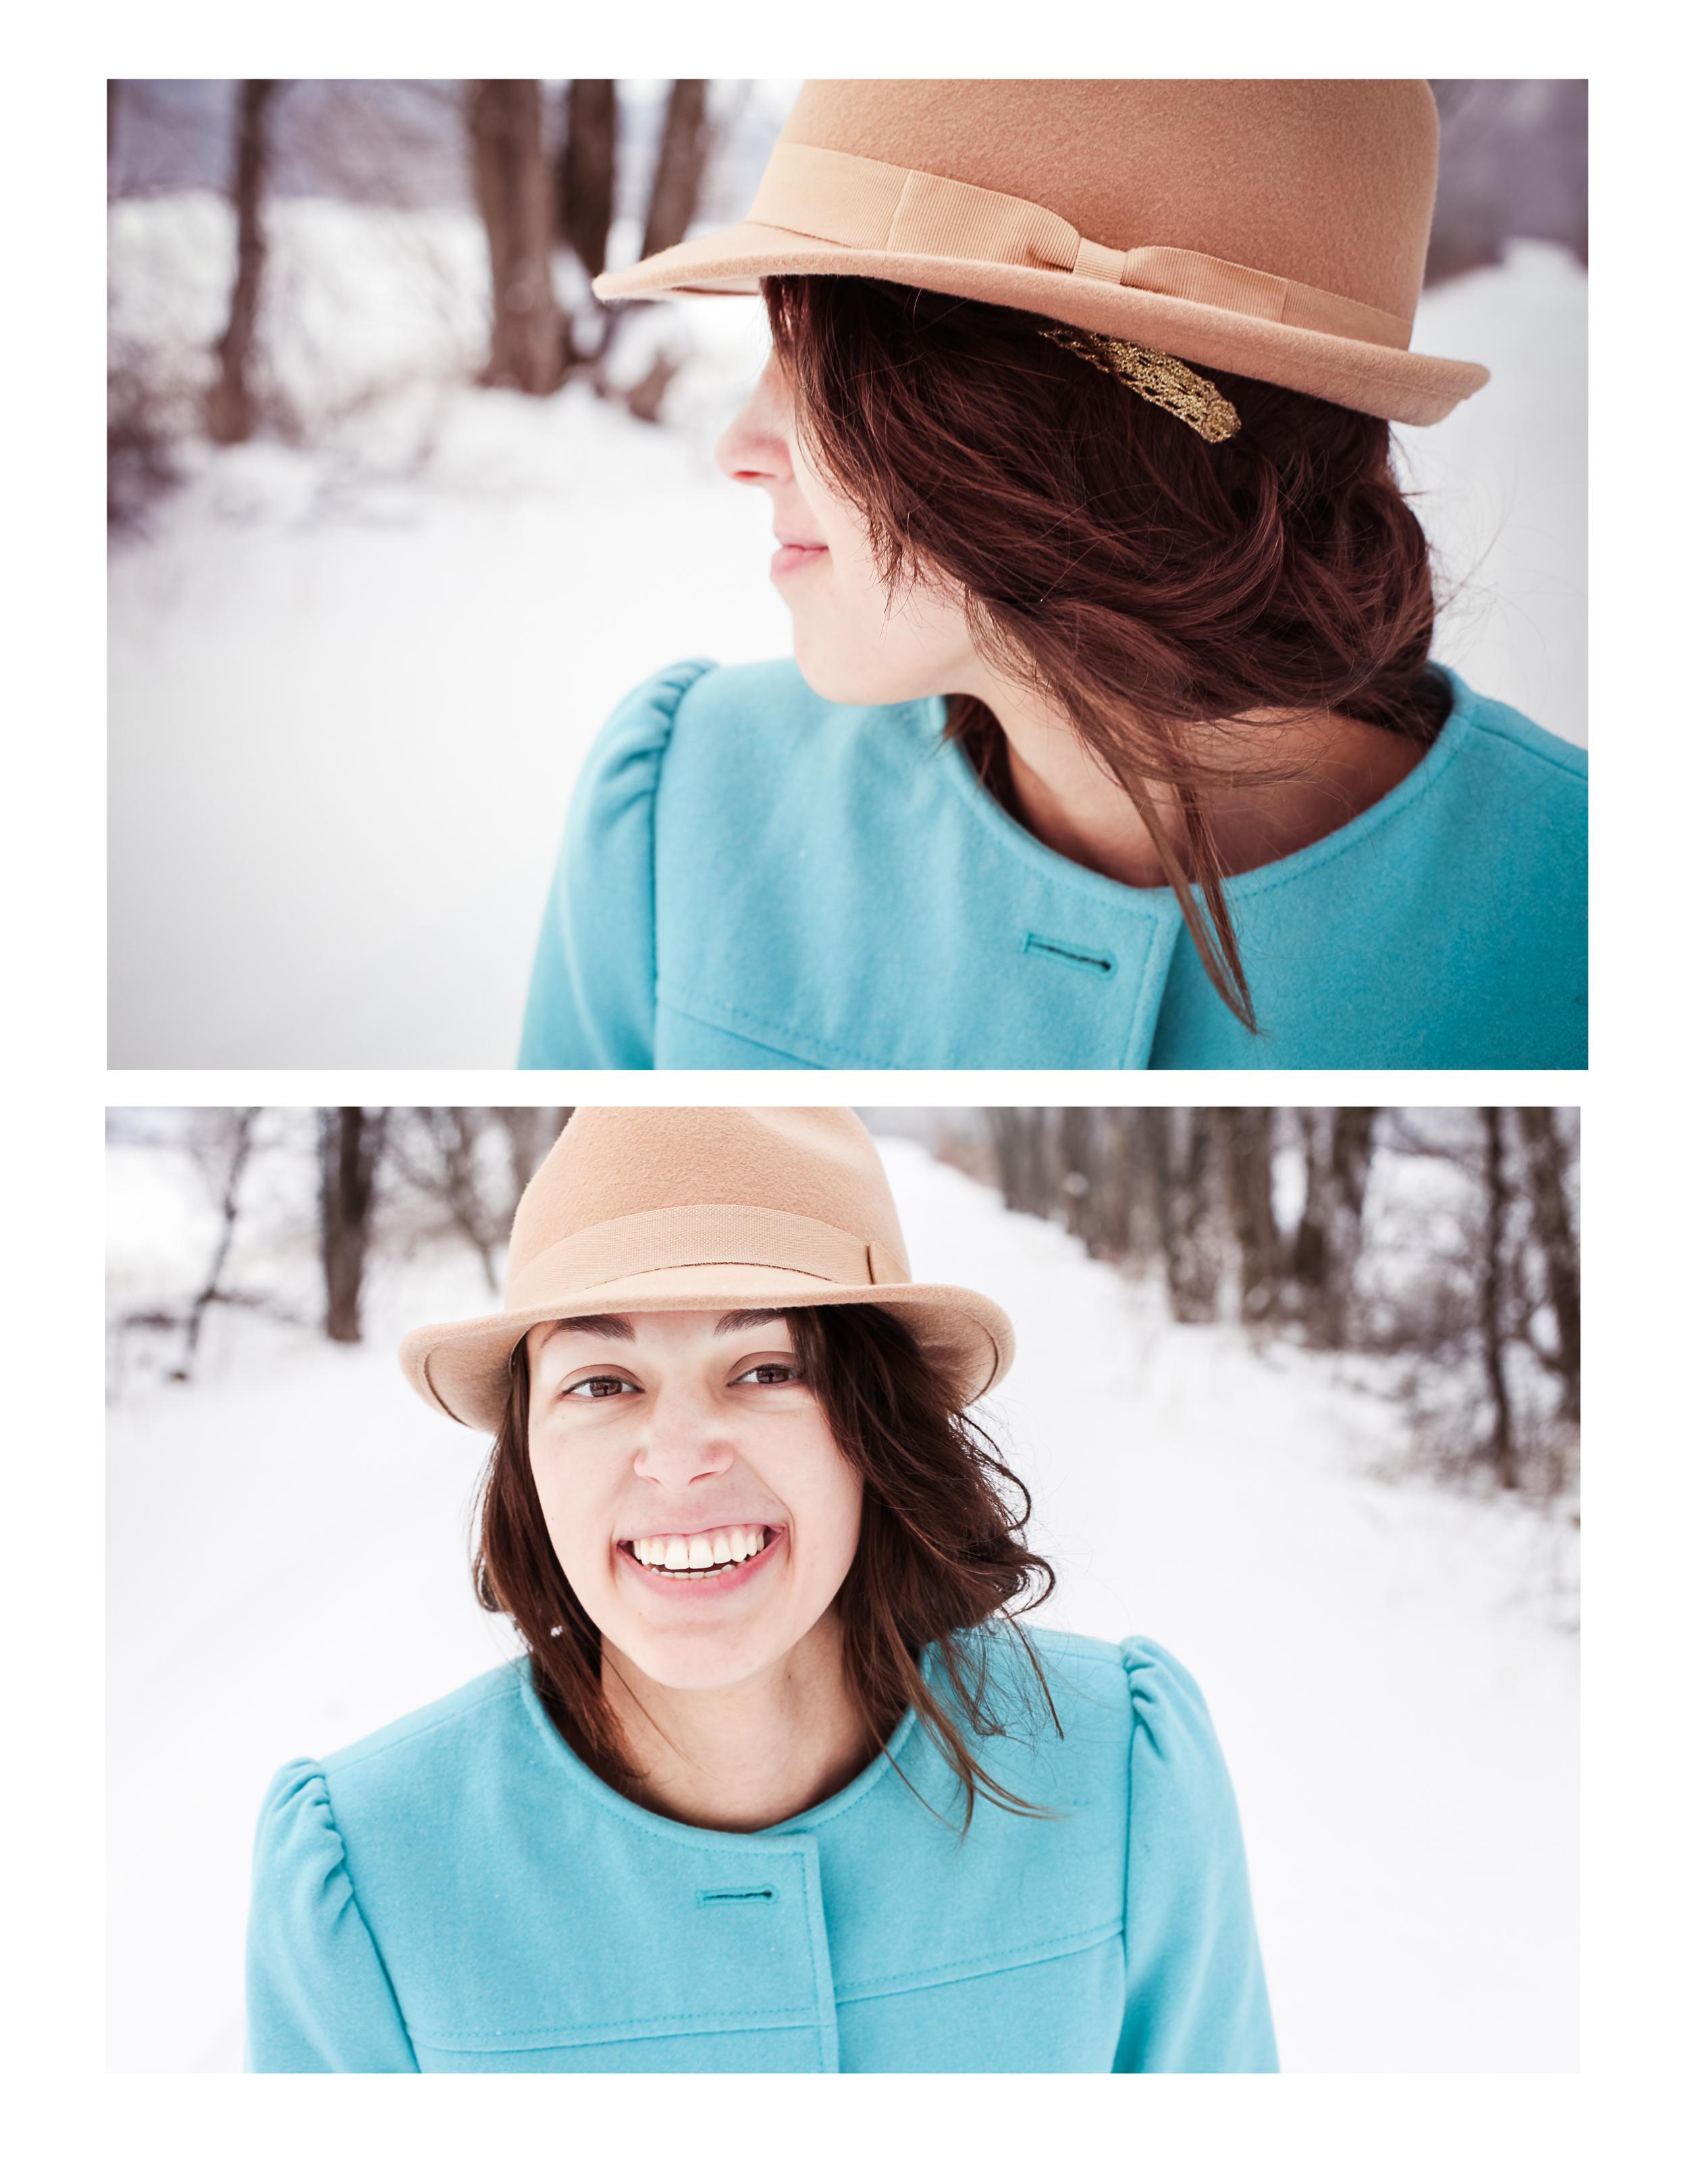 chelsea collage3.jpg